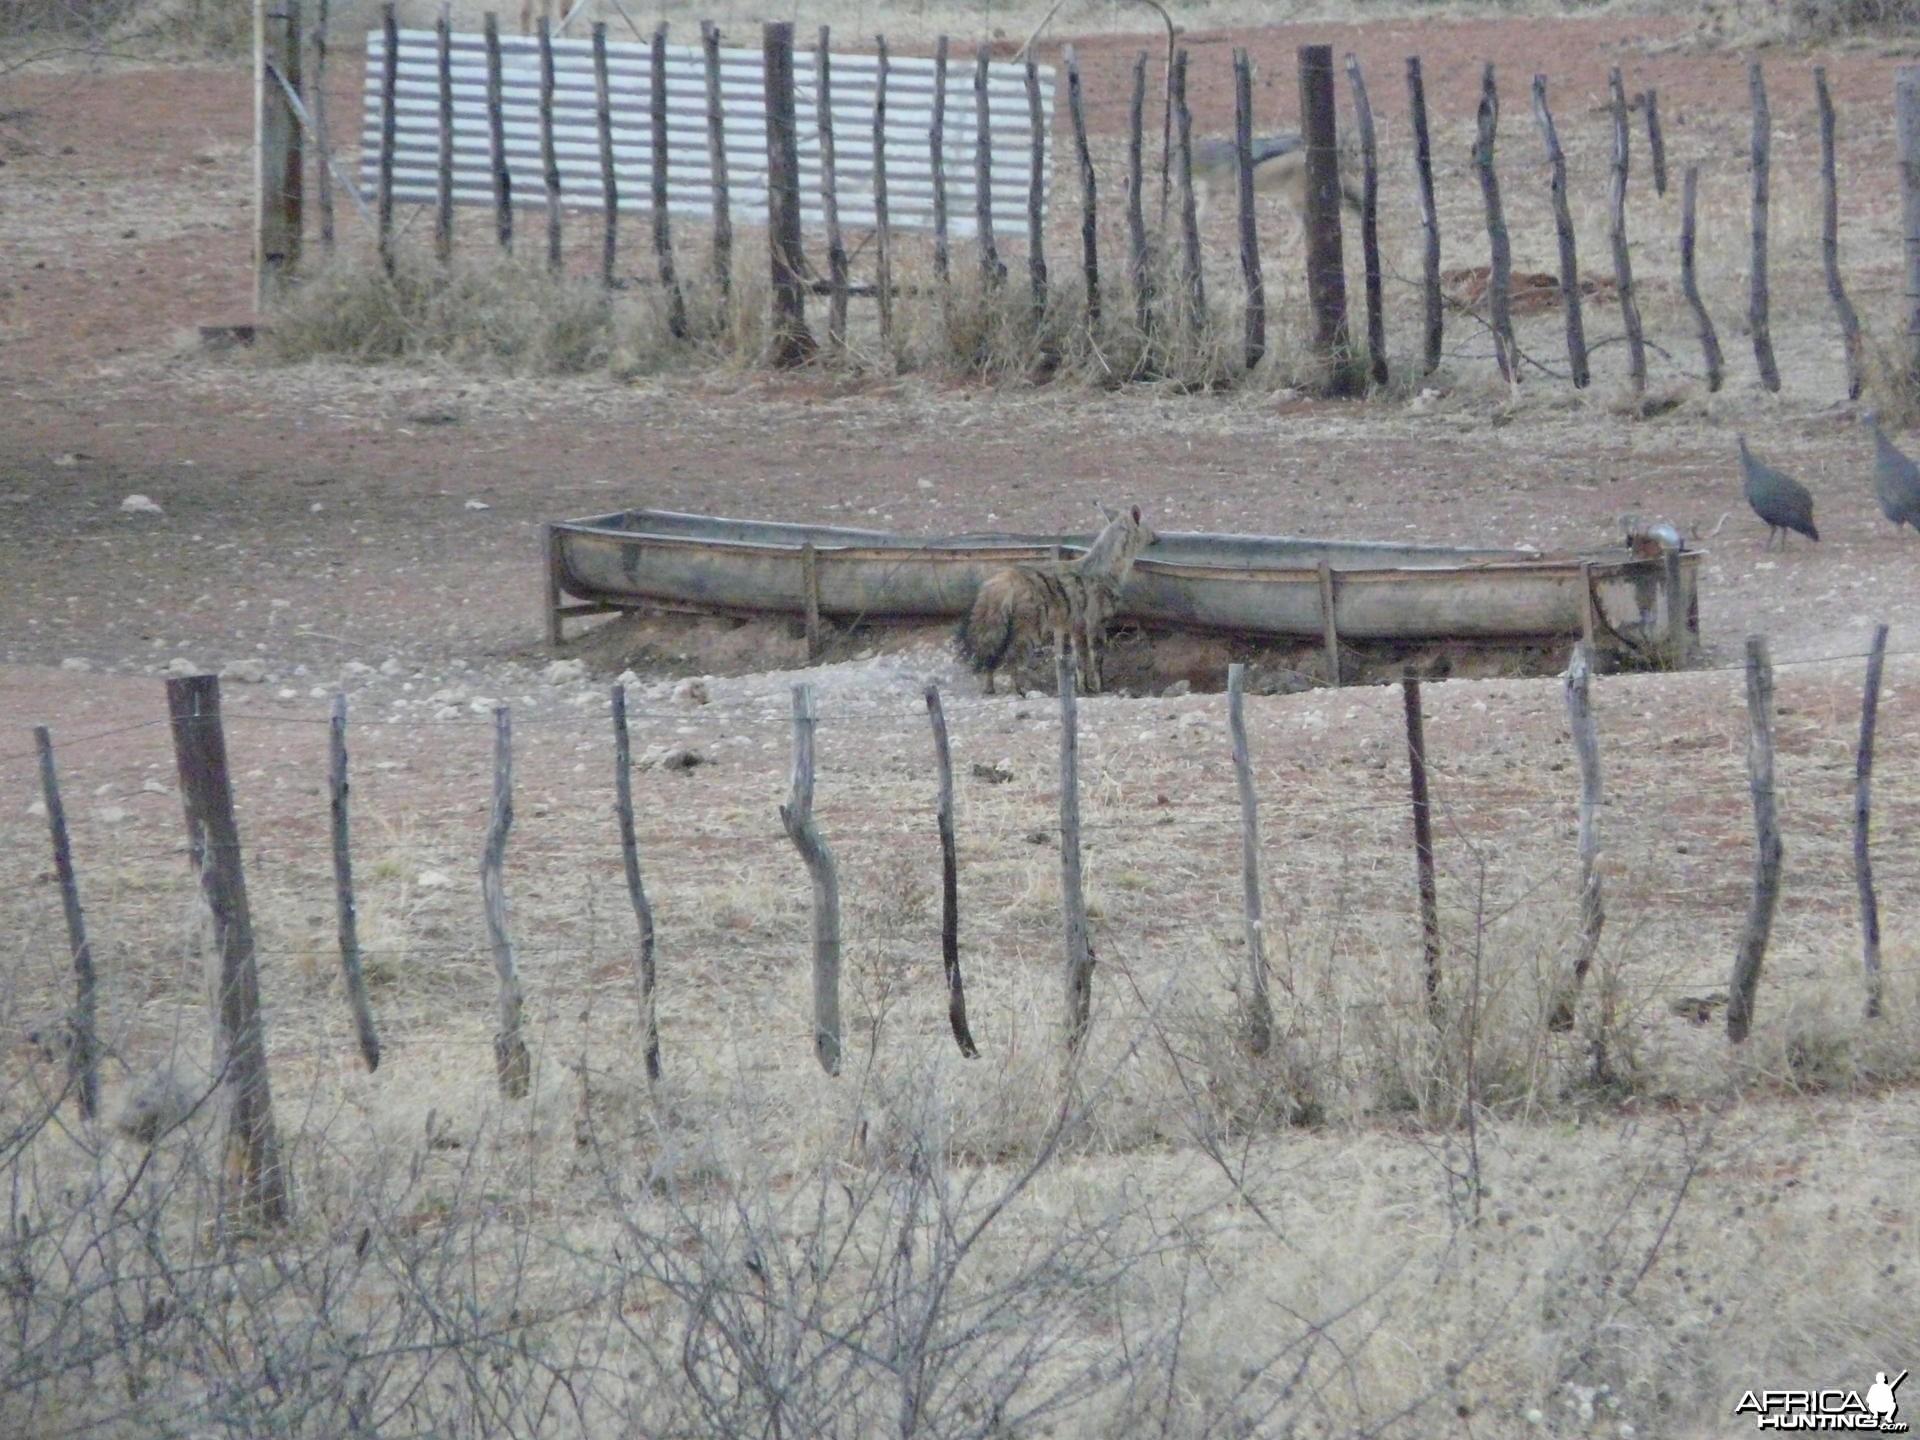 Aardwolf (Proteles cristata) in Namibia